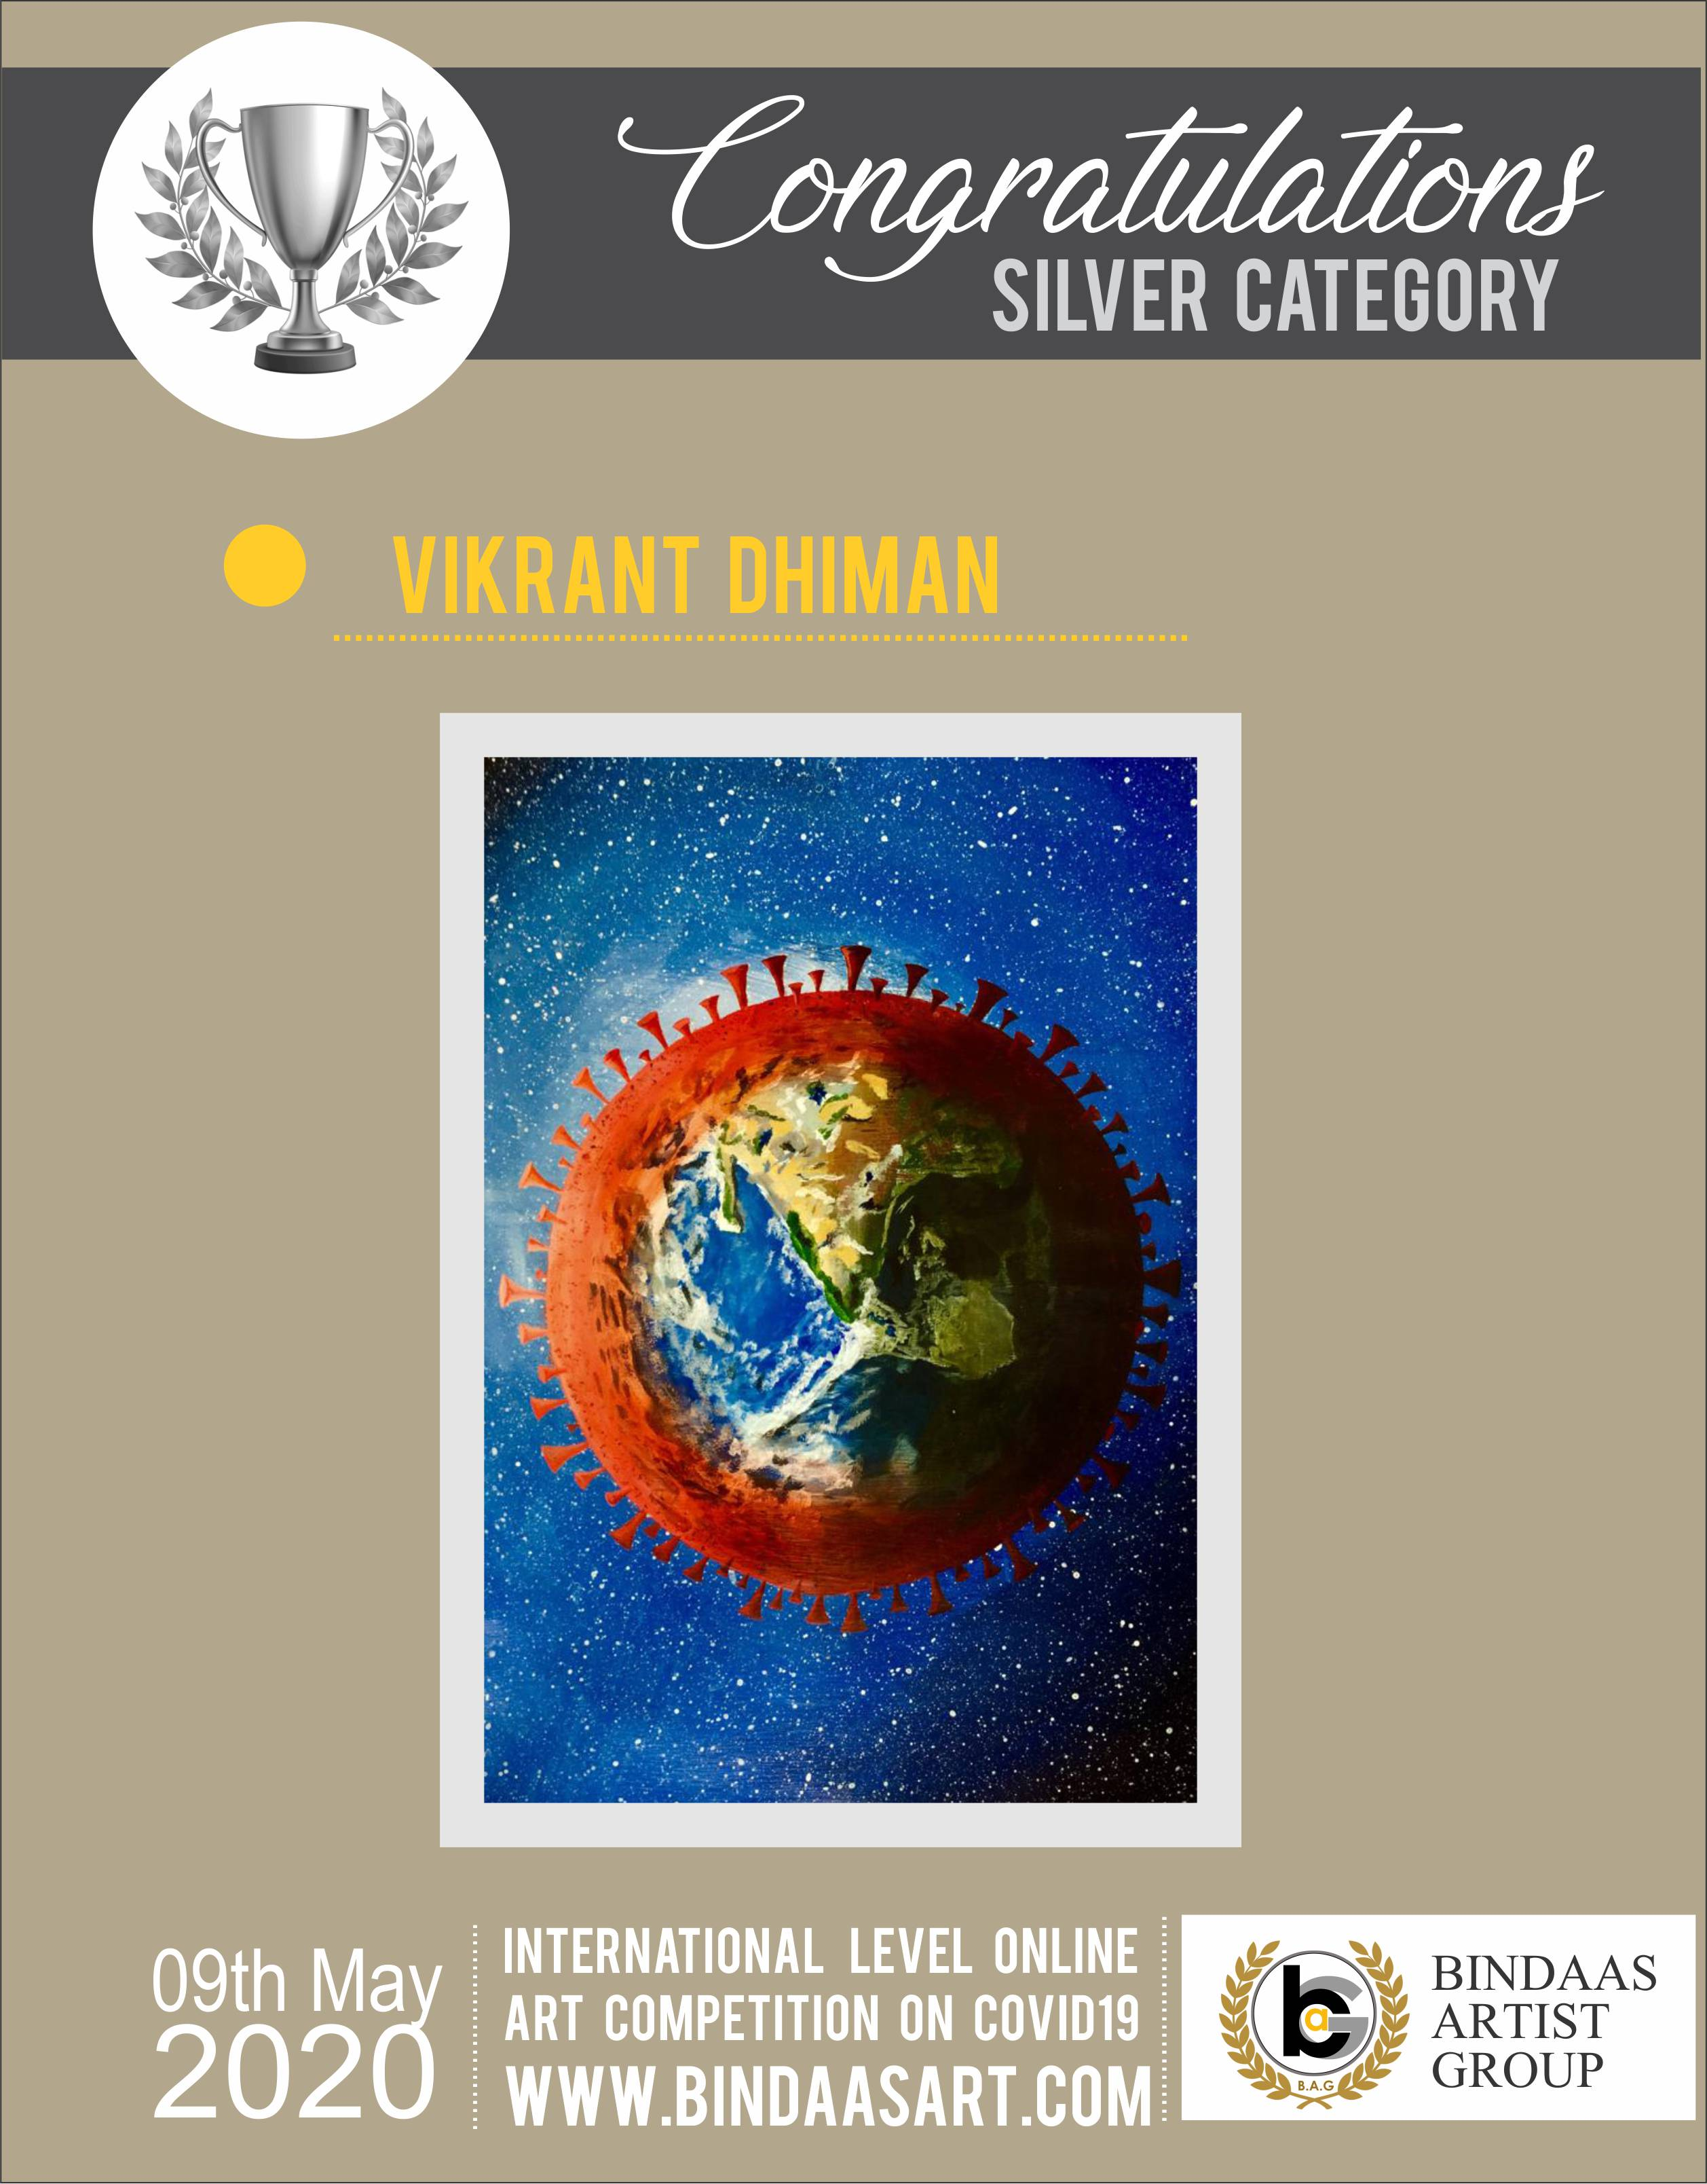 Vikrant Dhiman